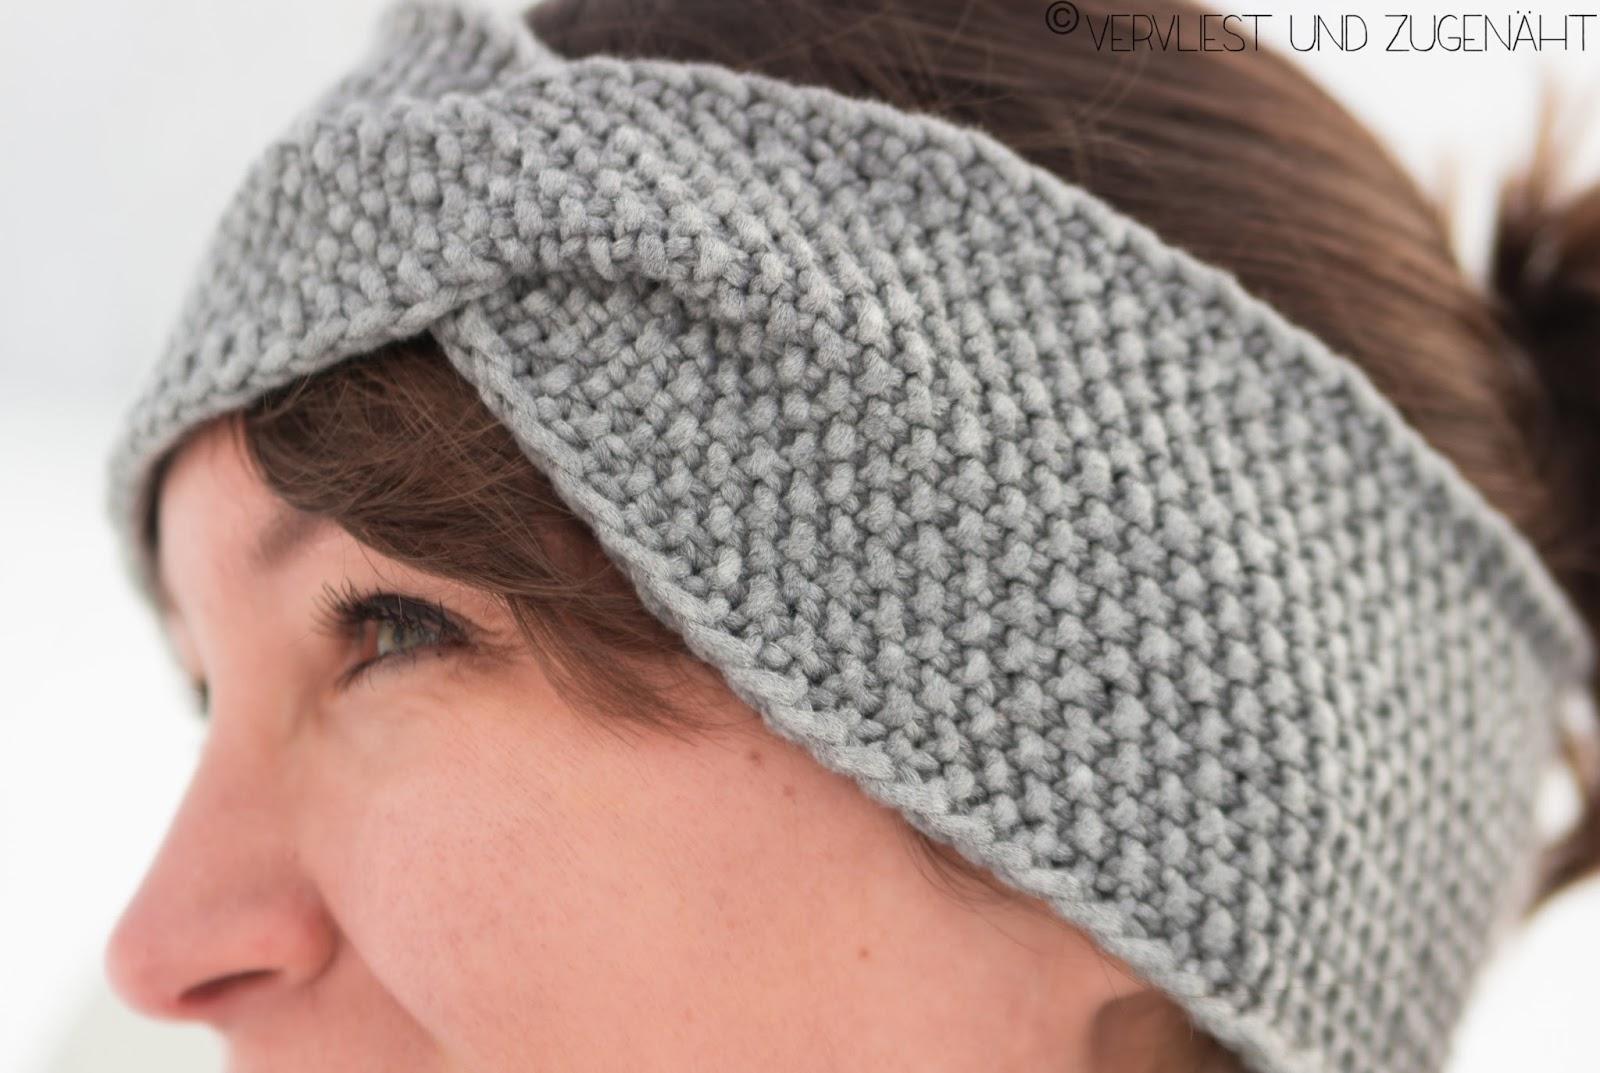 Berühmt Häkelarbeitwinter Stirnbänder Muster Ideen - Strickmuster ...